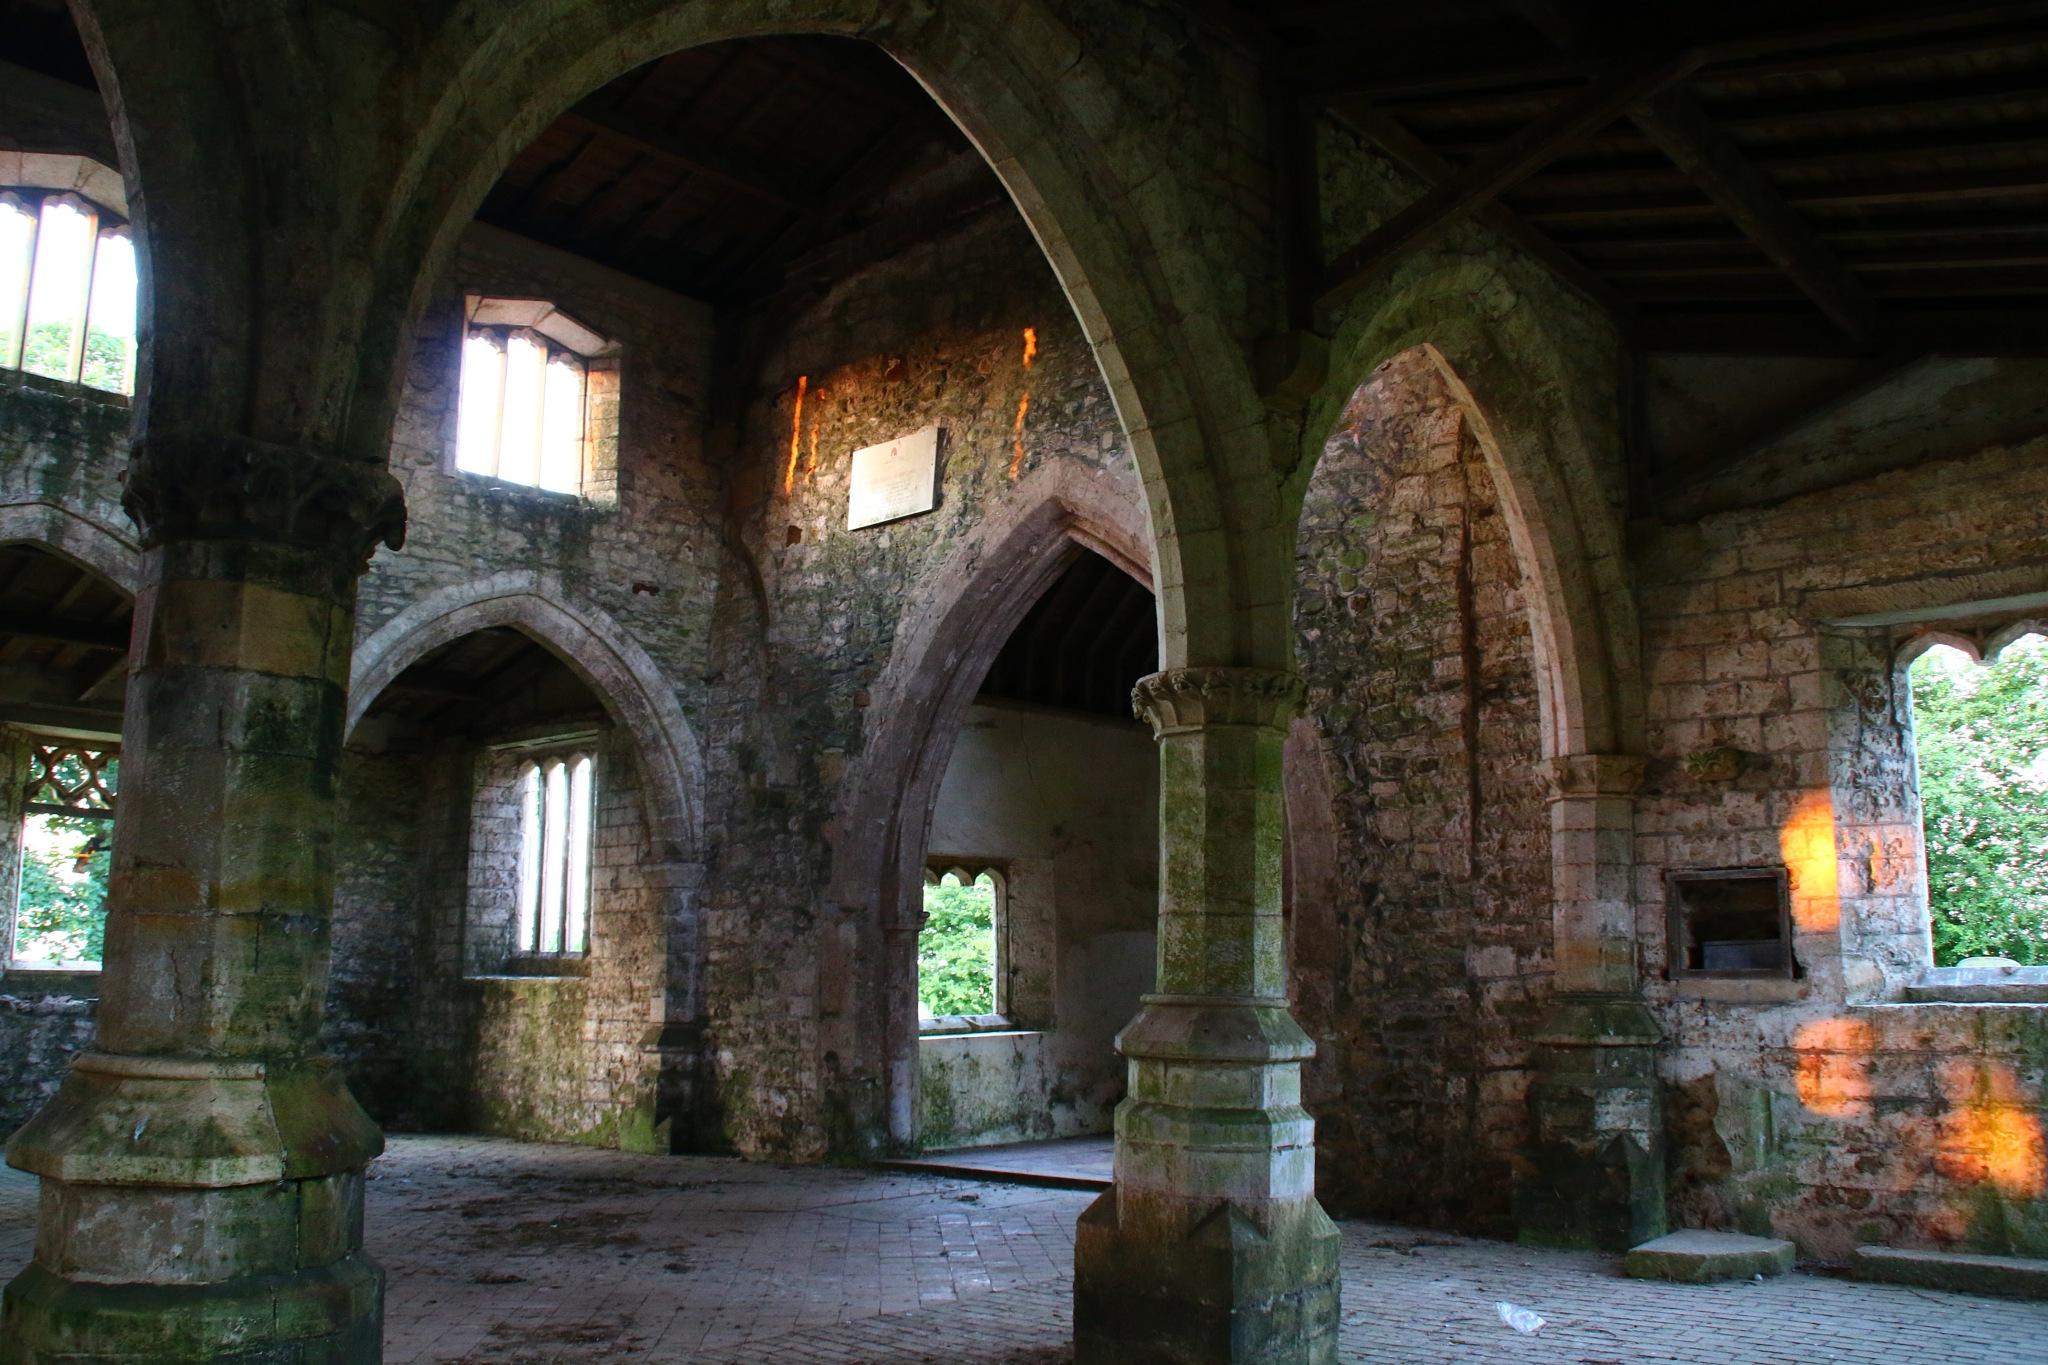 St Boltophs Church by Lynnette Bolton